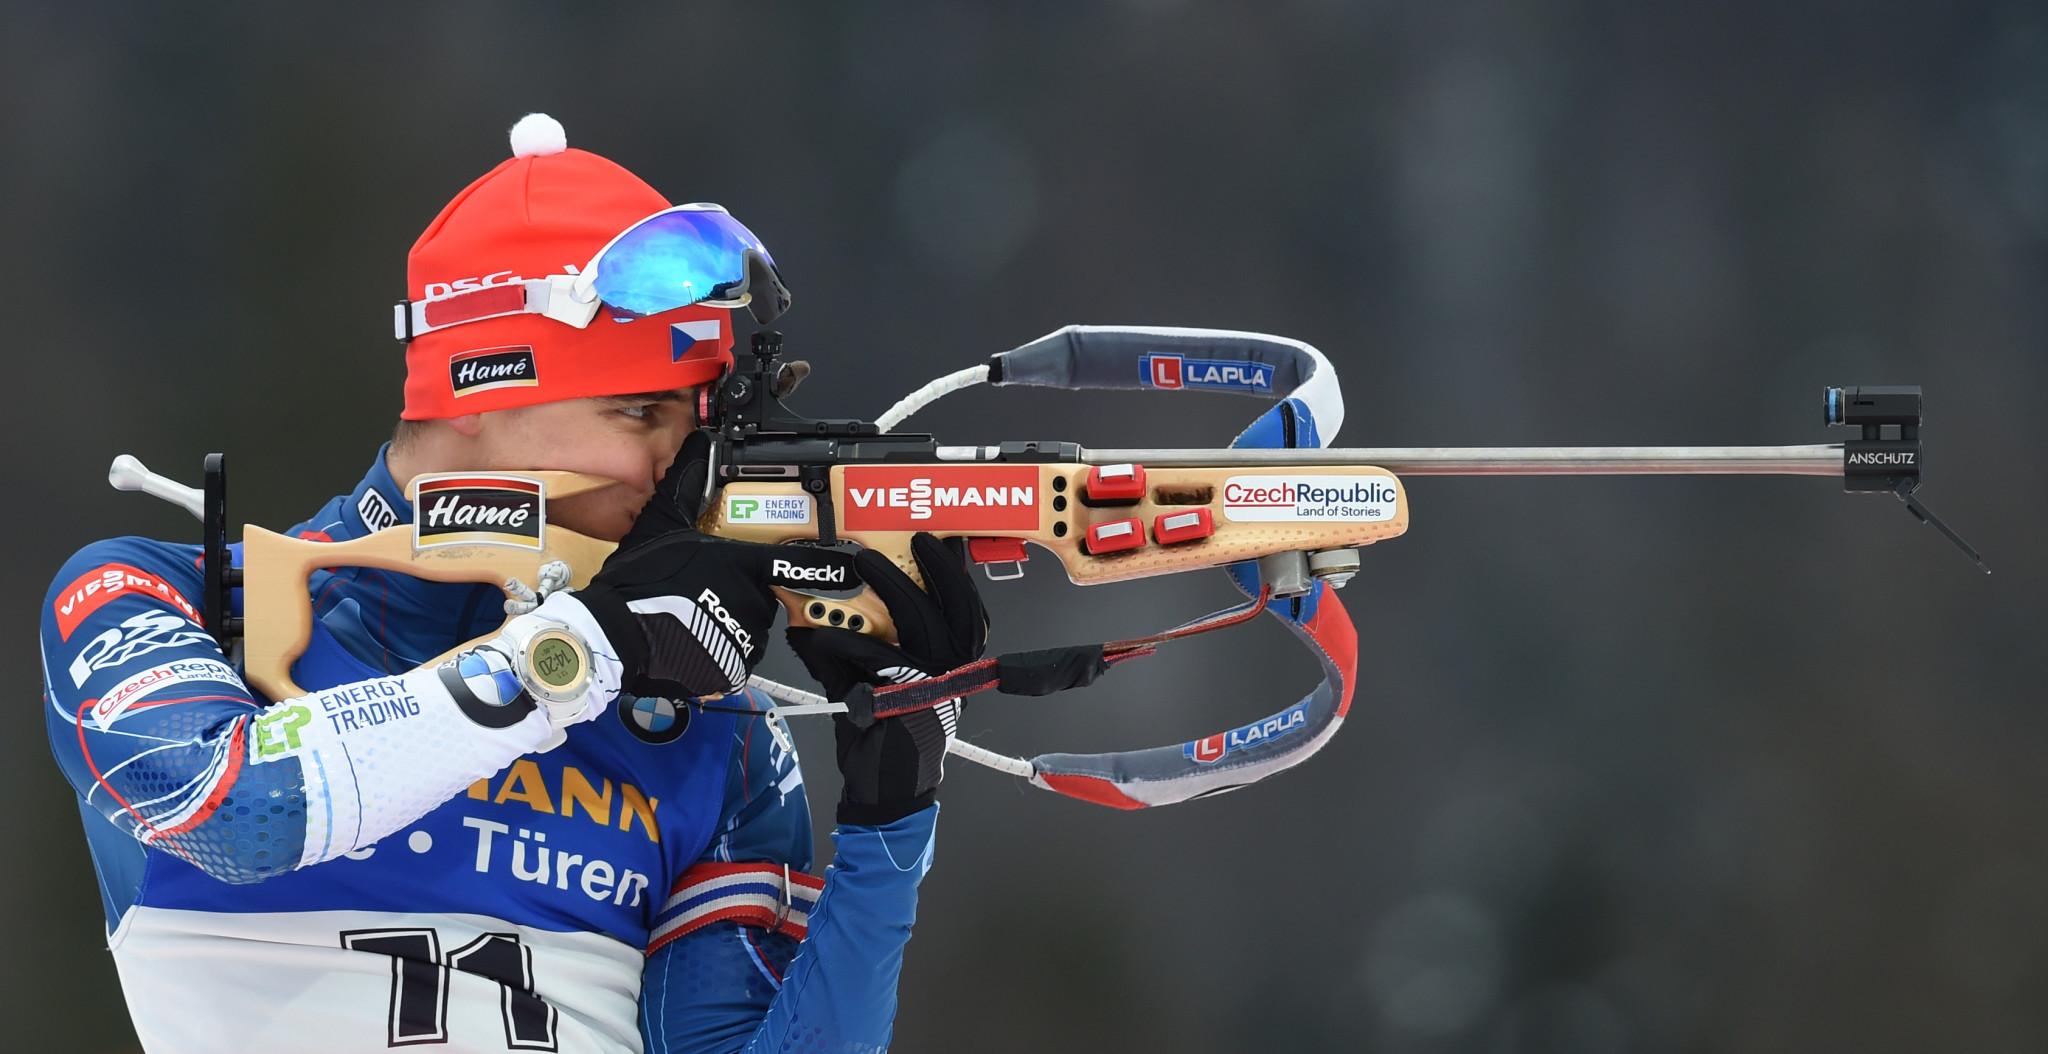 Krčmář and Hojnisz-Starega hold their nerve to win titles at IBU Summer Biathlon World Championships